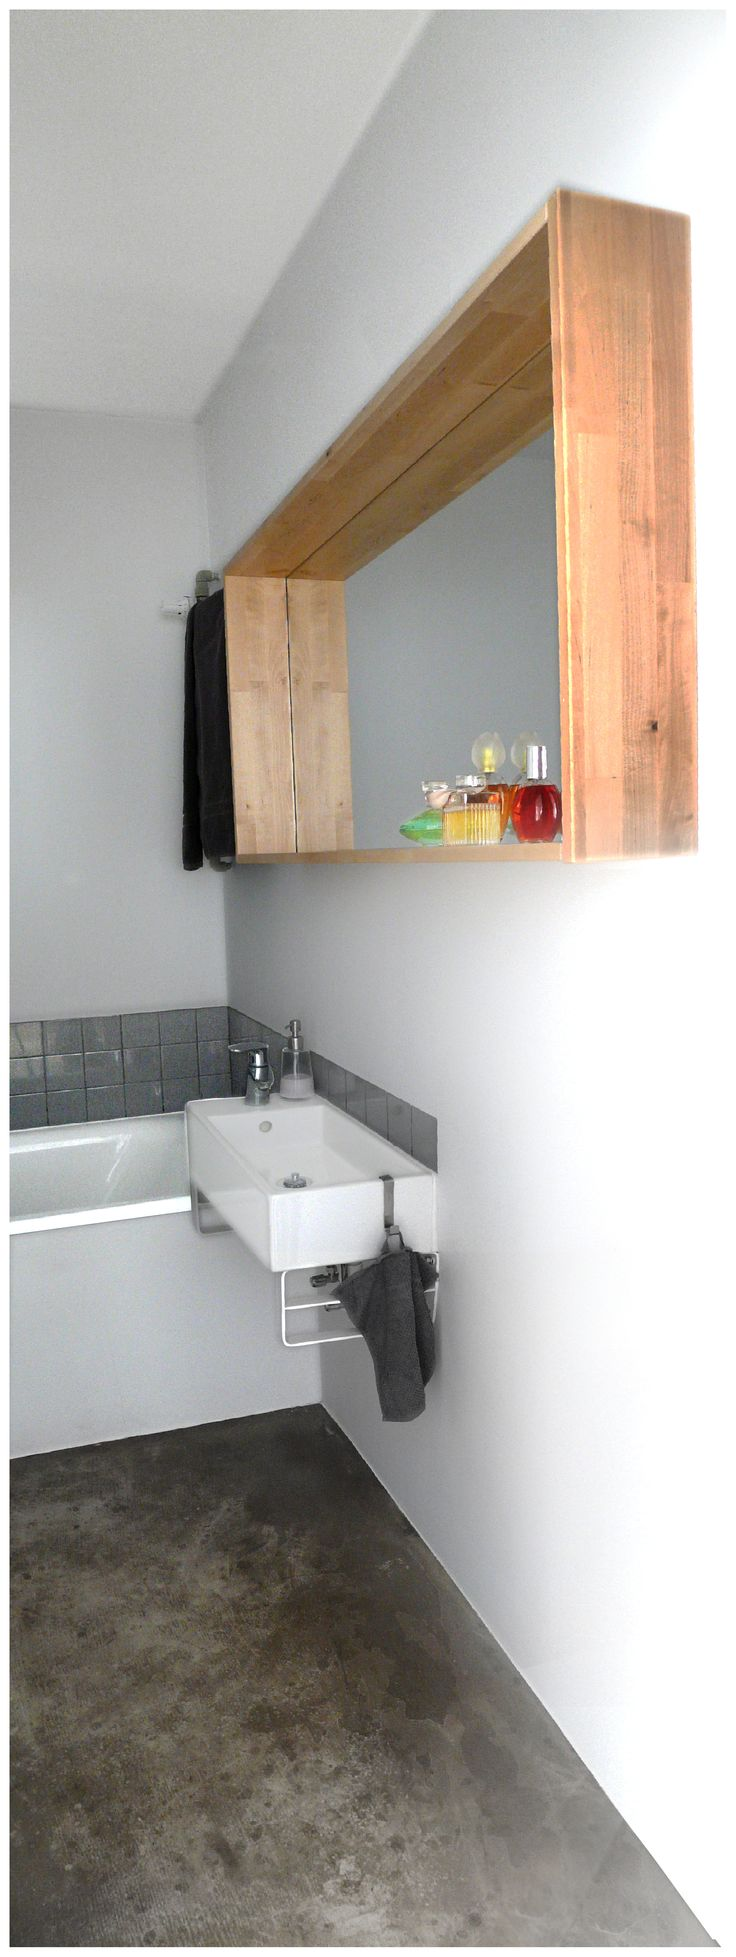 www.kwadratowymetr.pl Concrete floor in simple white and grey bathroom.